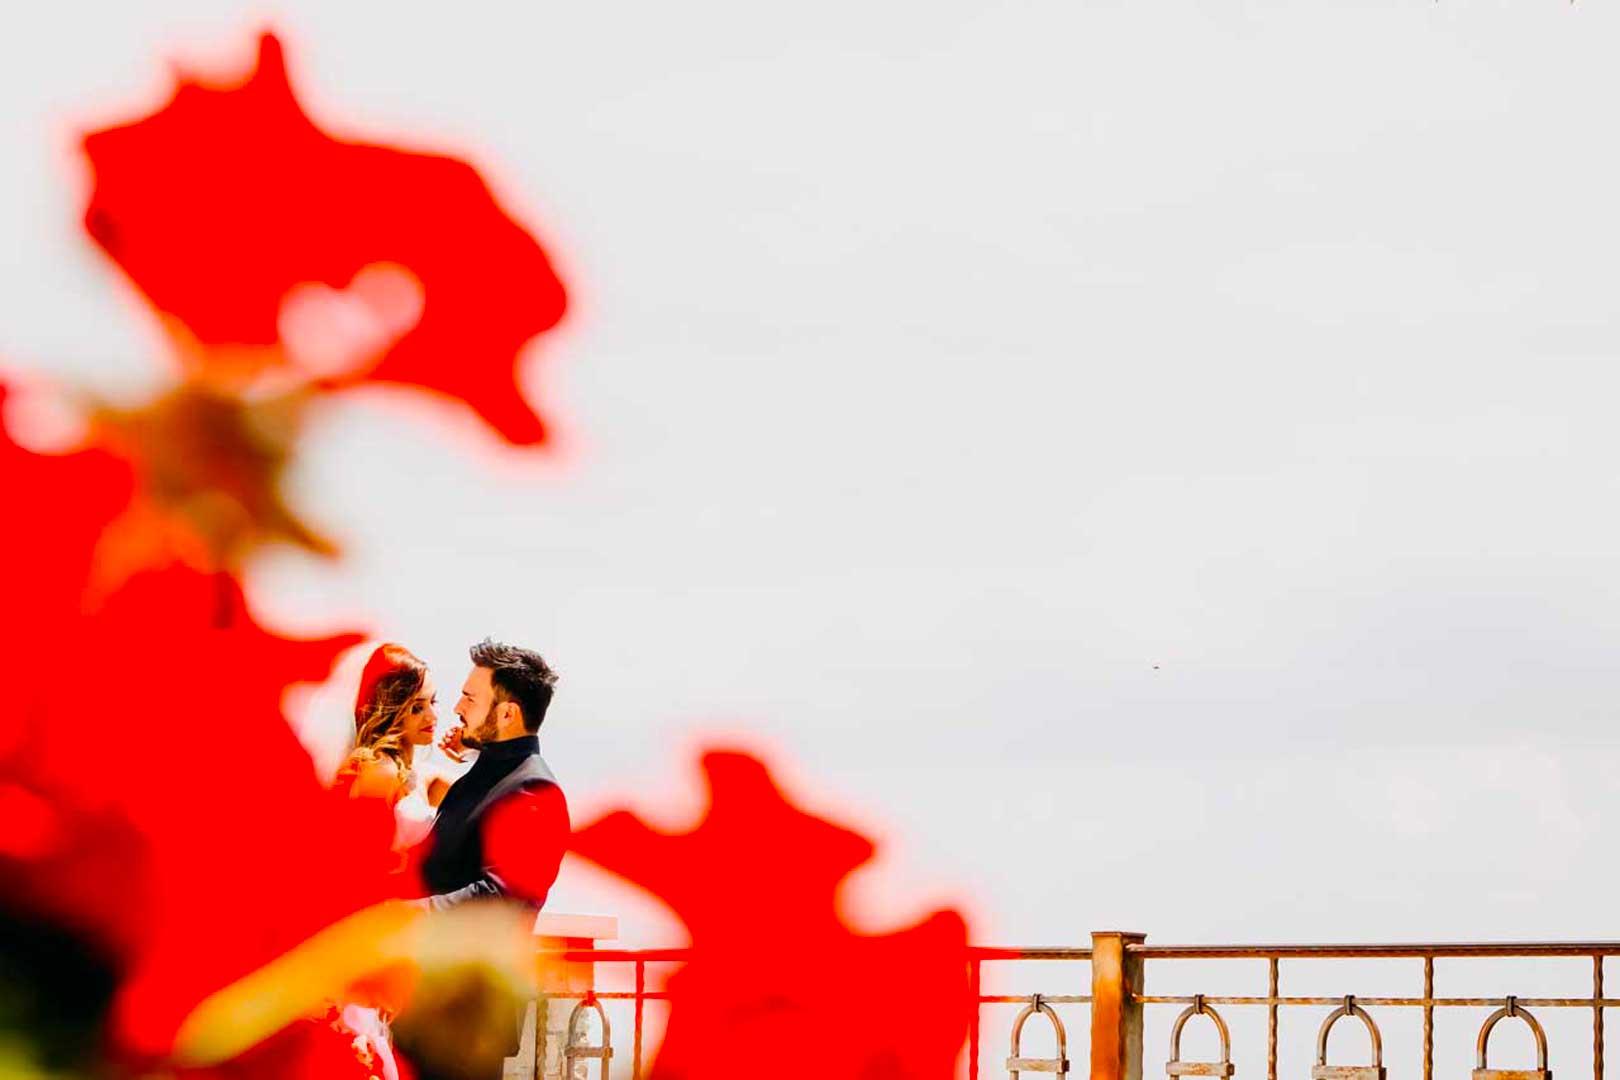 016-matrimonio-puglia-gargano-gianni-lepore-wedding-photographer